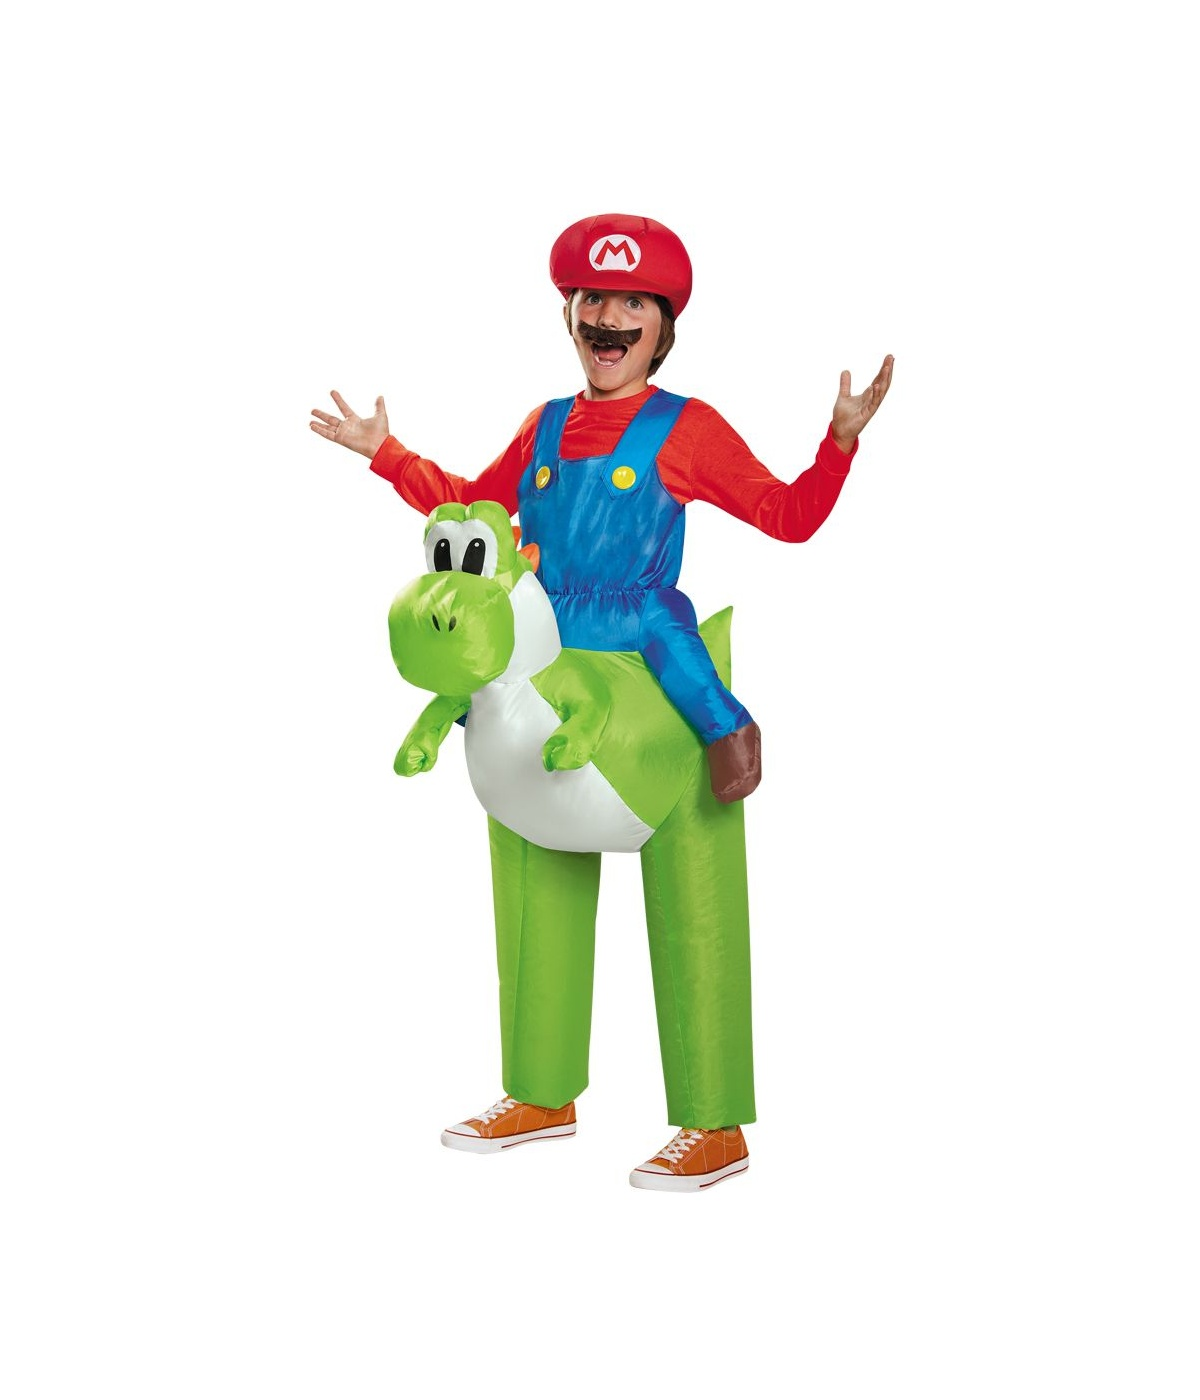 sc 1 st  Halloween Costumes & Super Mario Bros Mario Riding Yoshi Boys Costume - Video Game Costumes